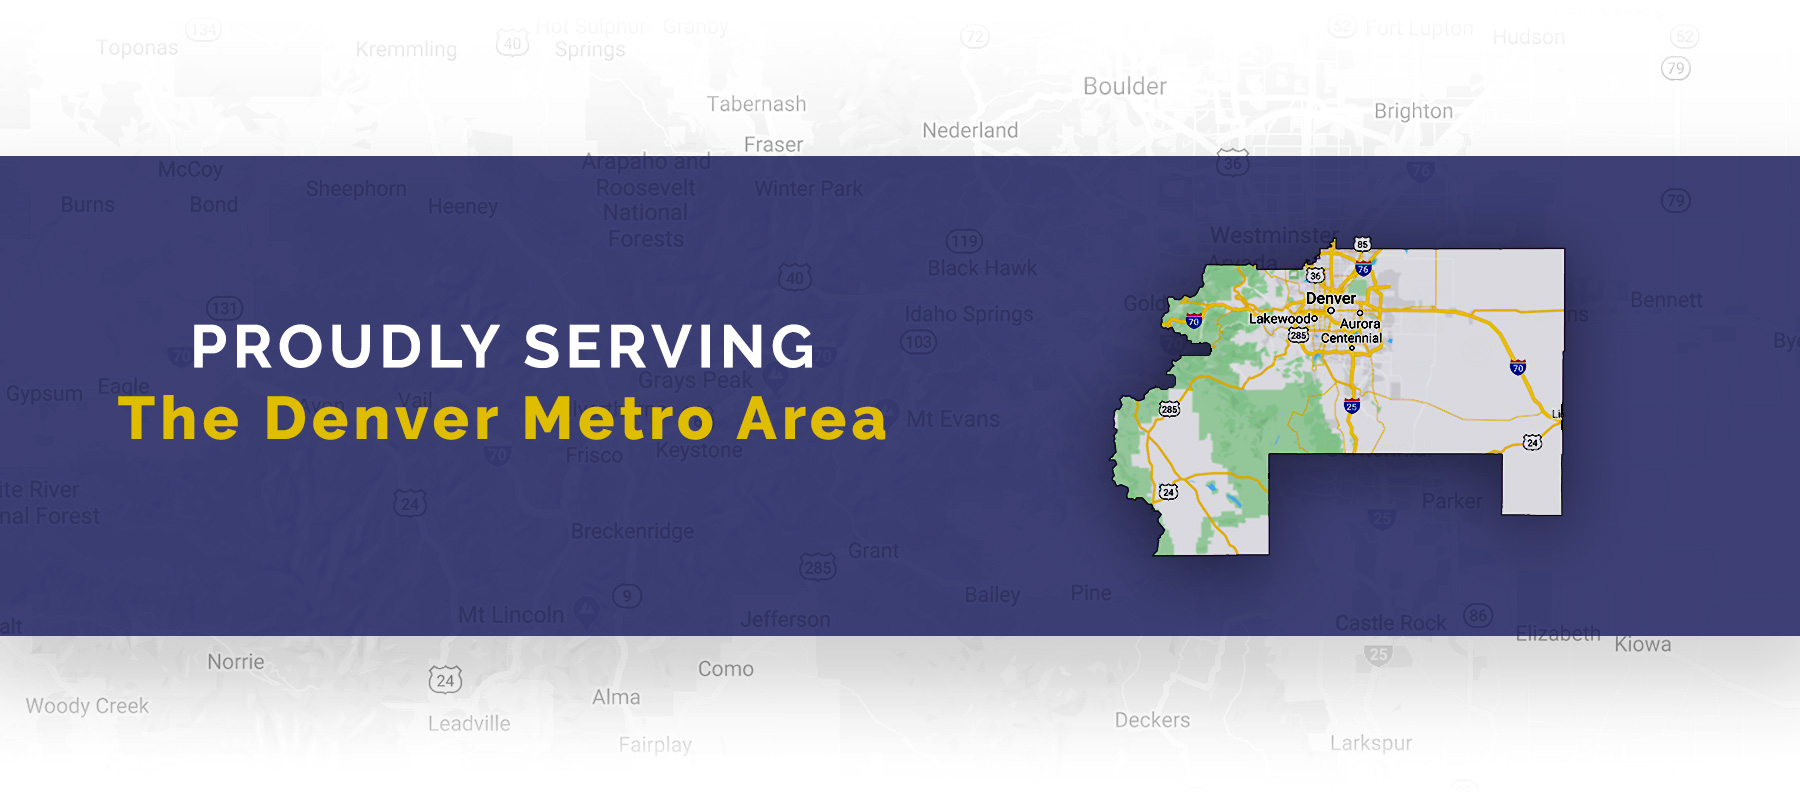 The Denver Metro Area